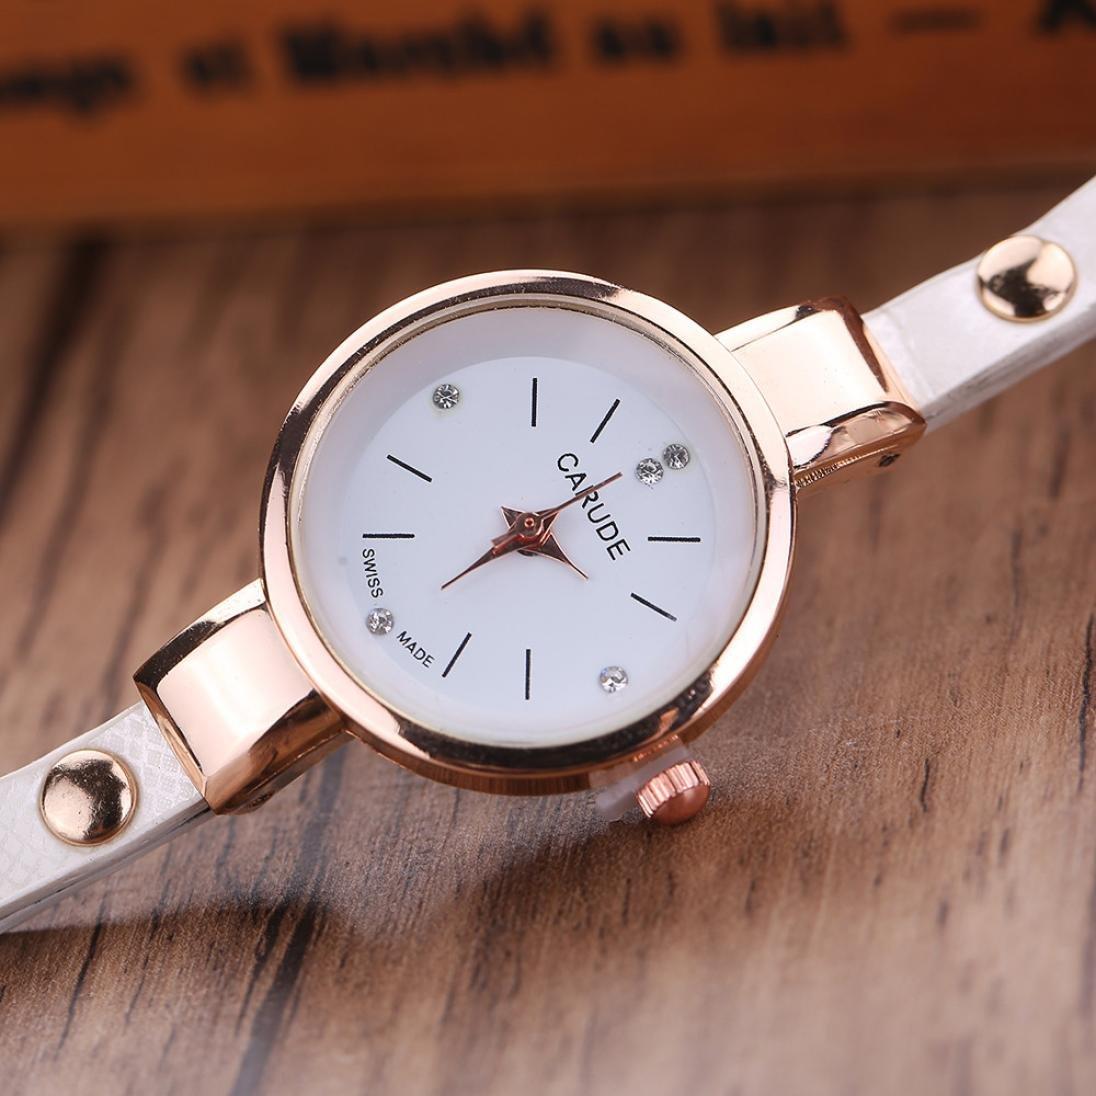 Amazon.com: LtrottedJ Women Leather Rhinestone Analog Quartz Wrist Watches (White): Health & Personal Care